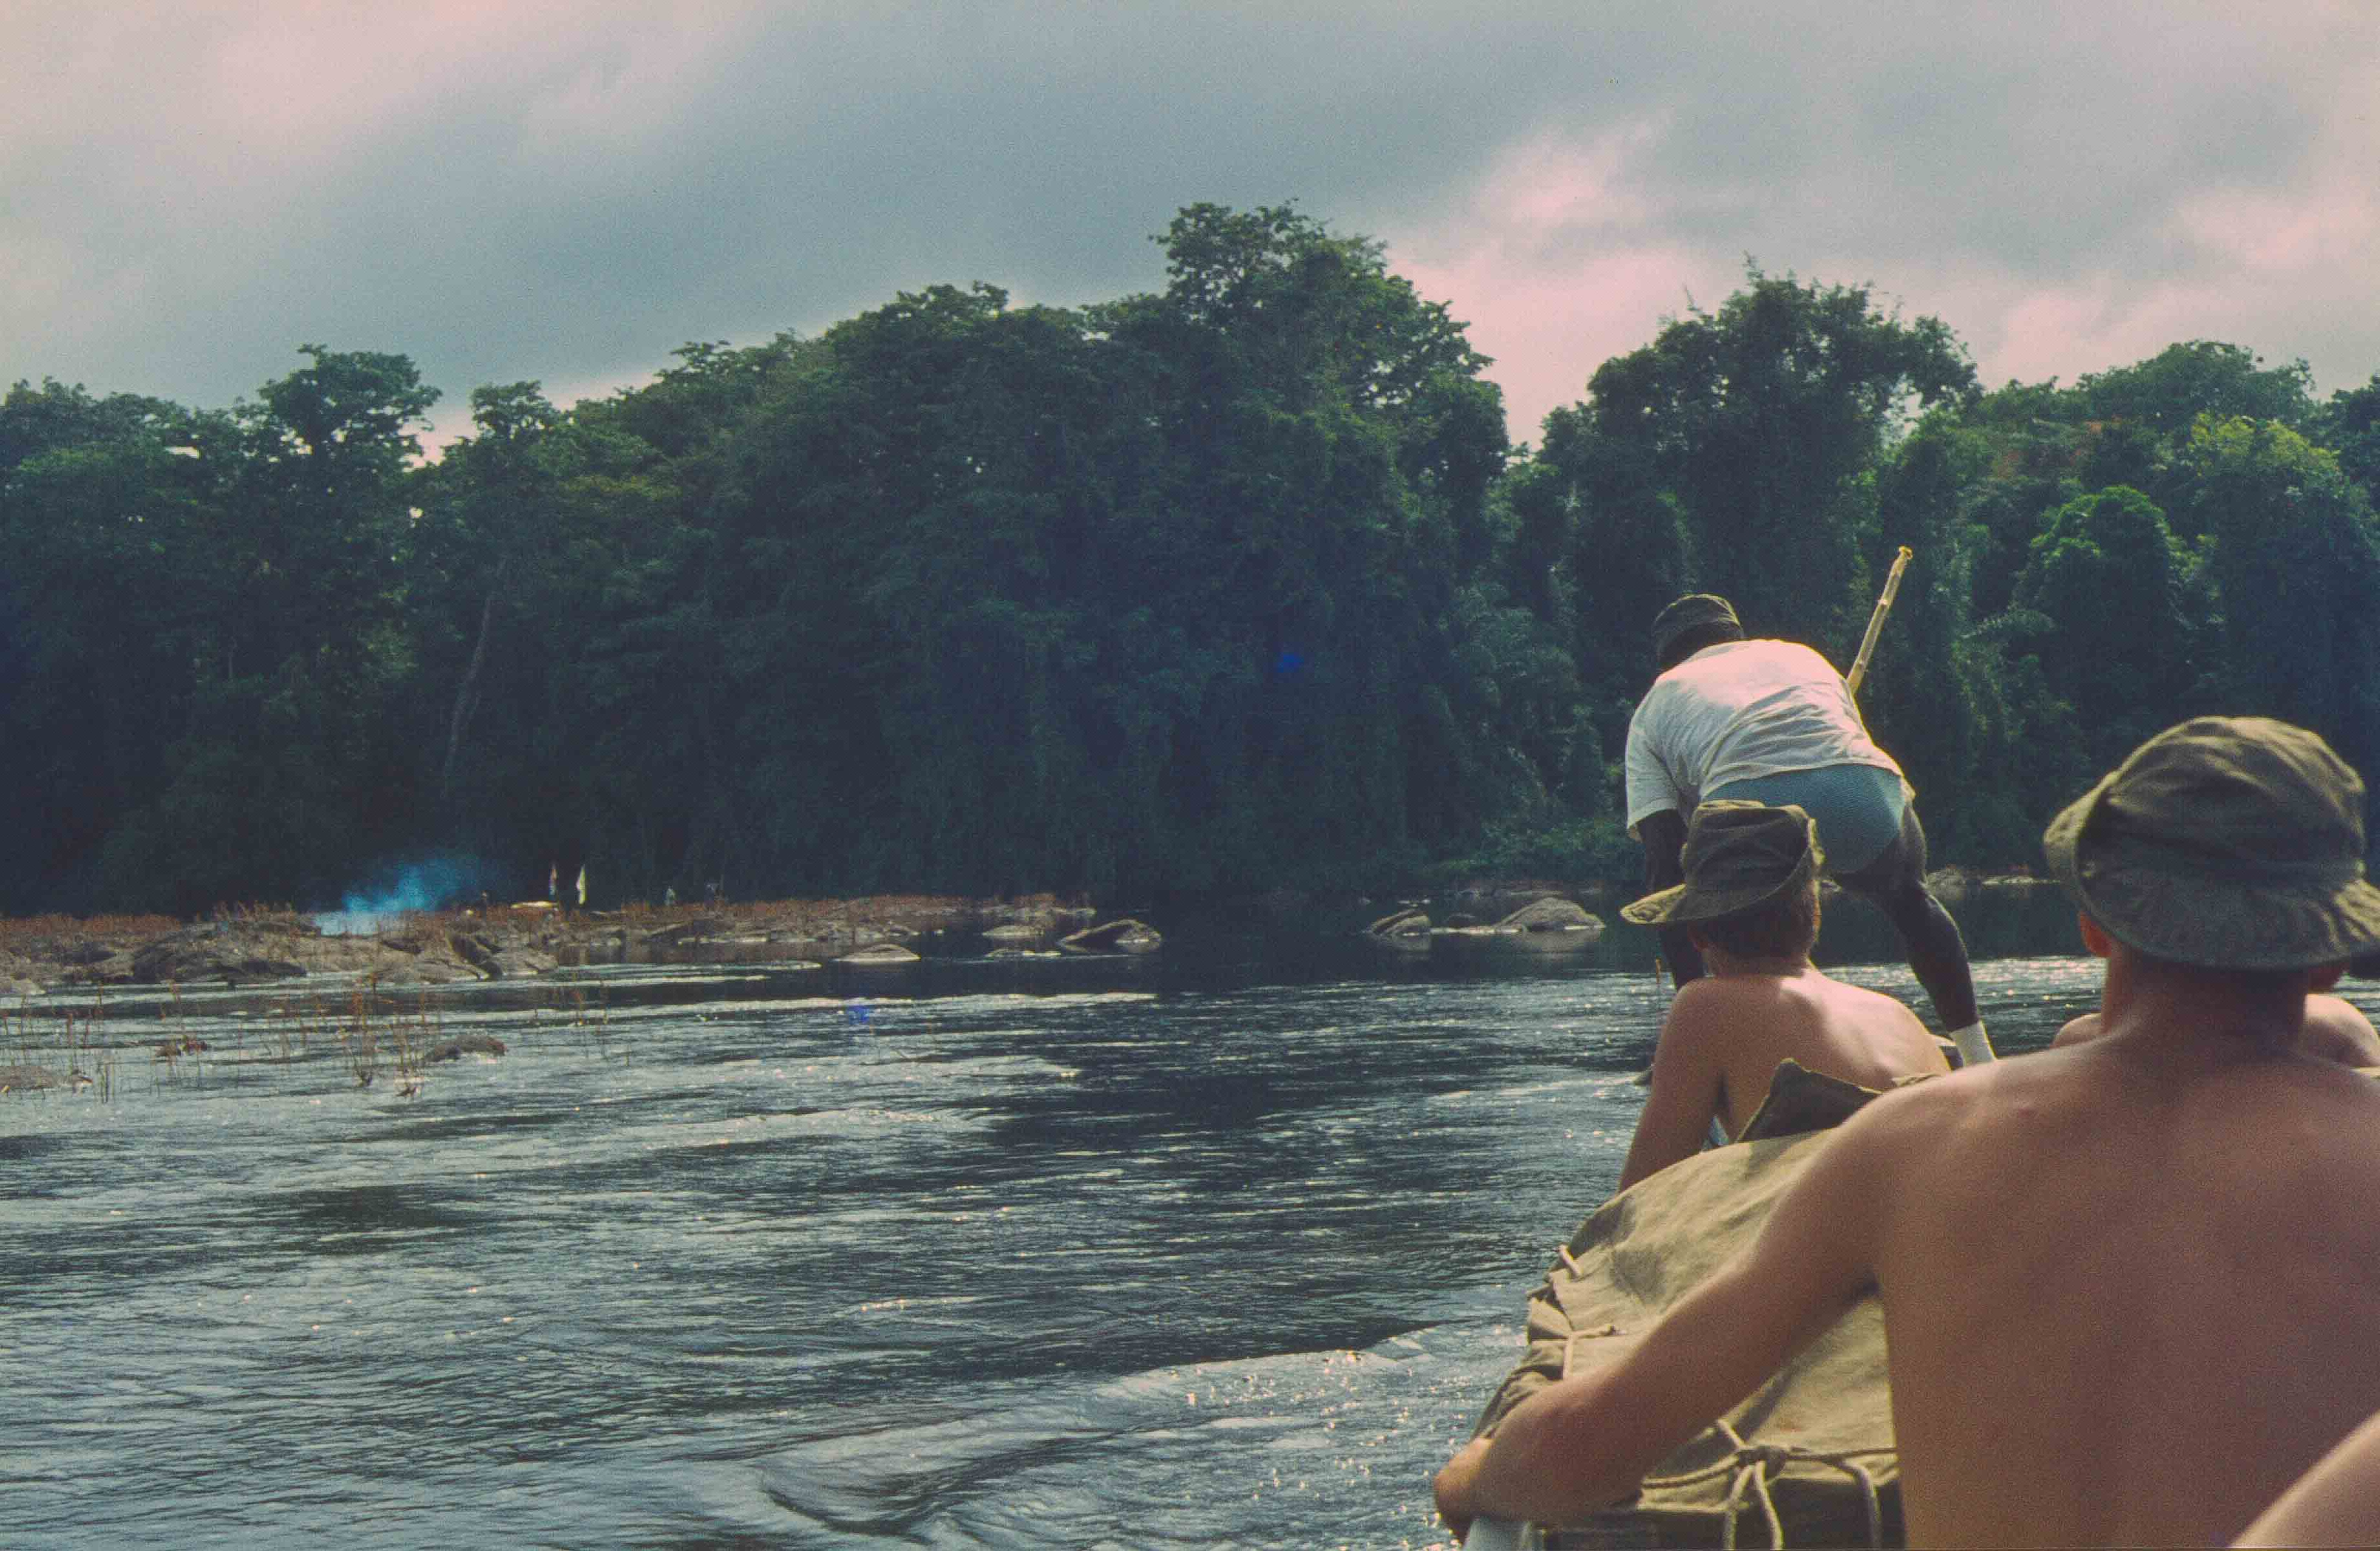 462. Suriname